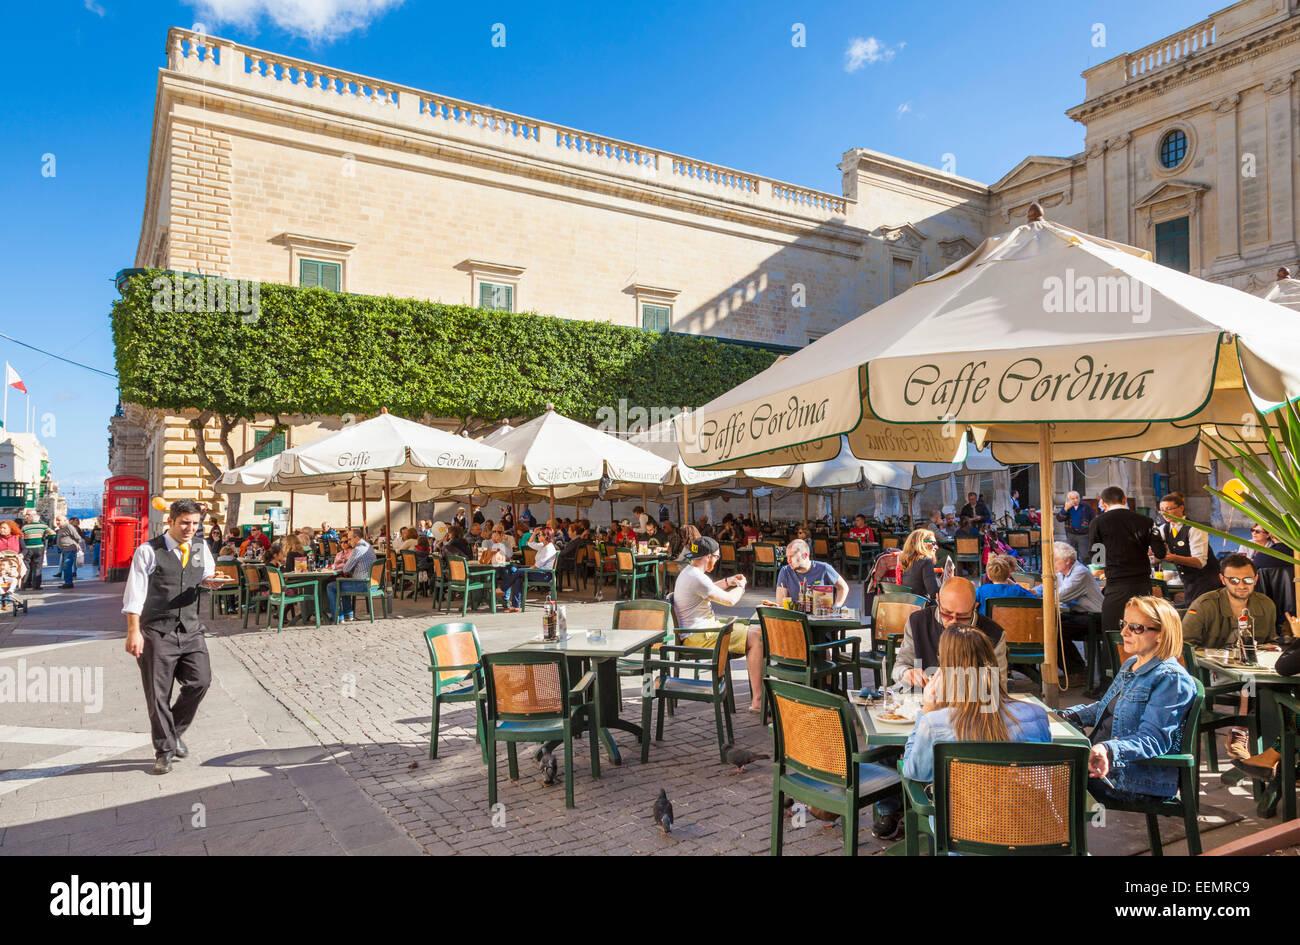 Tourists at the Cafe Cordina Piazza Regina Valletta Malta EU Europe - Stock Image